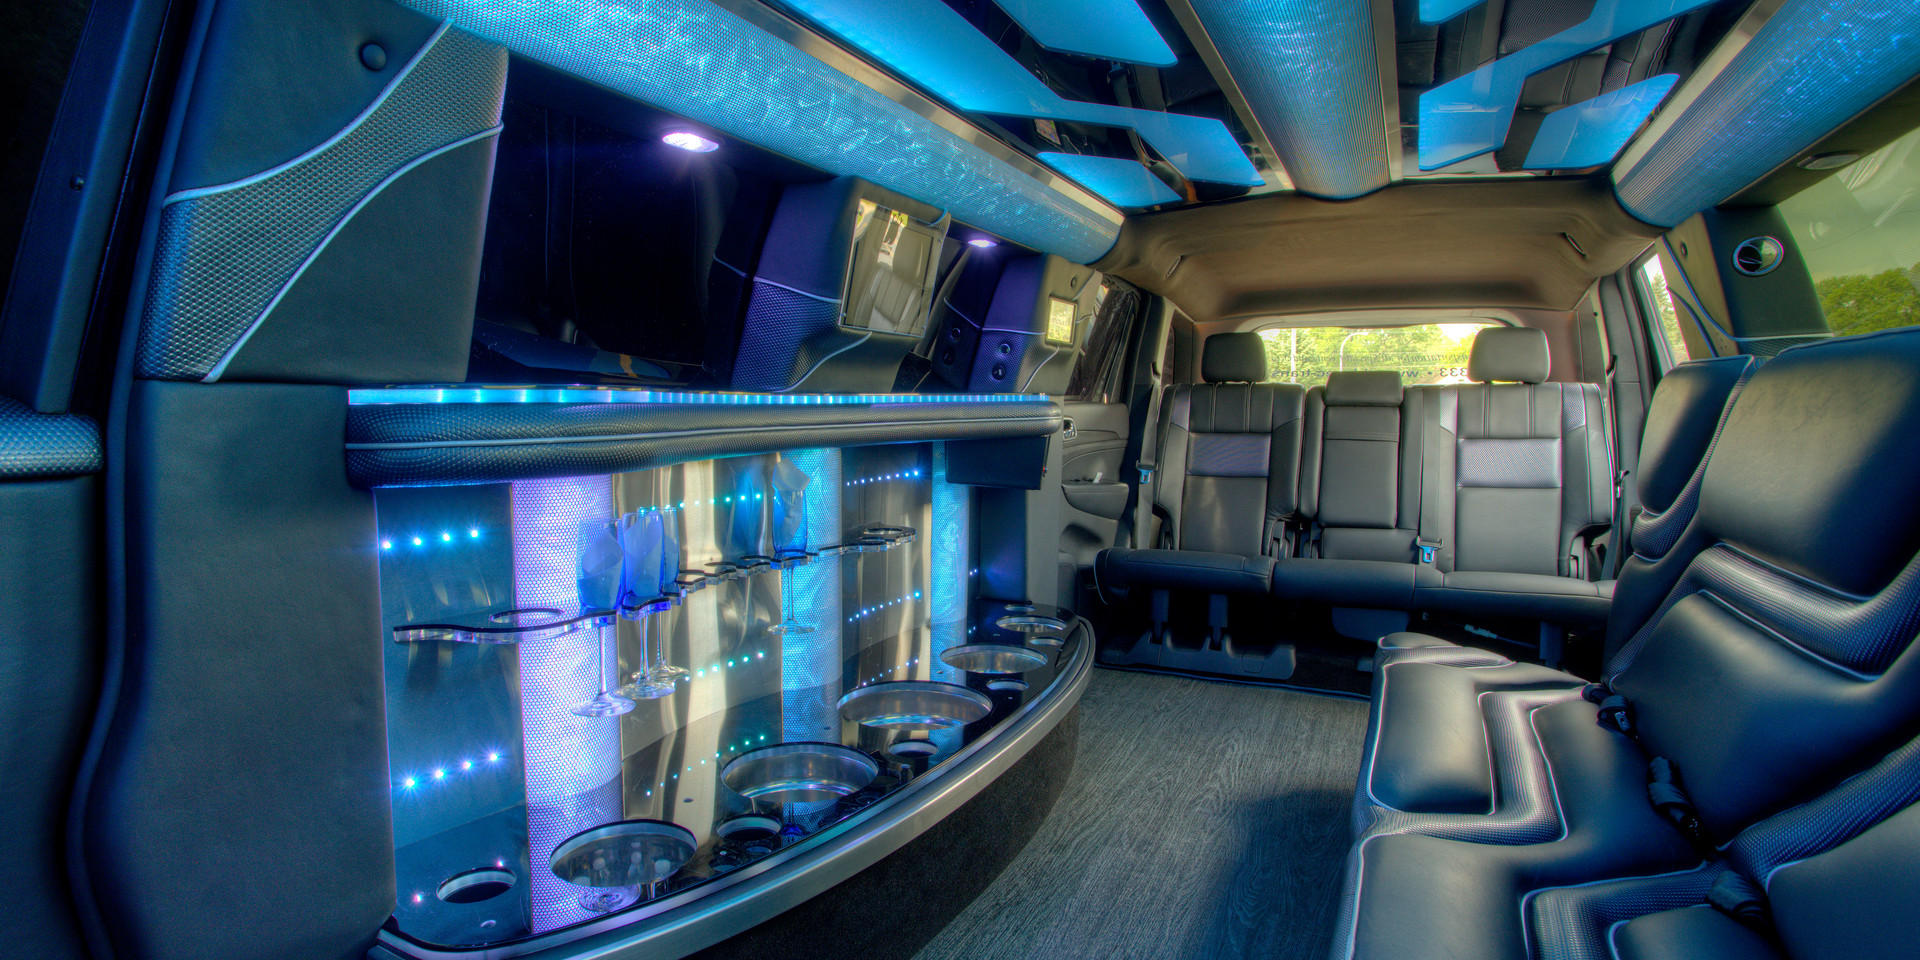 Jeep Limo Interior 11